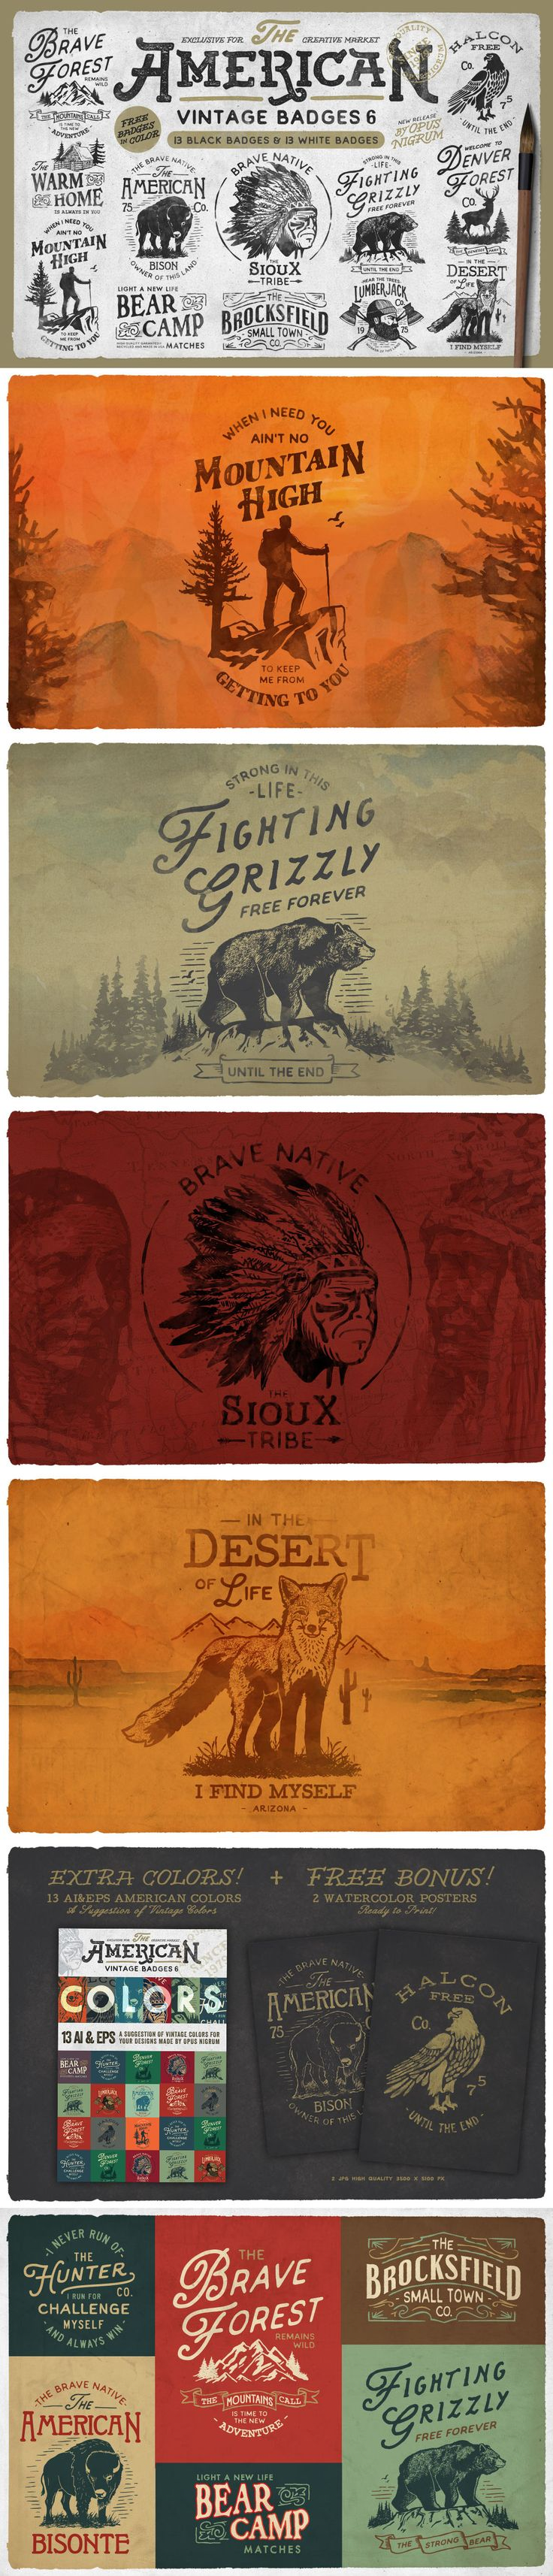 American Vintage Badges 6 #design Download: https://creativemarket.com/OpusNigrum/312025-American-Vintage-Badges-6?u=ksioks